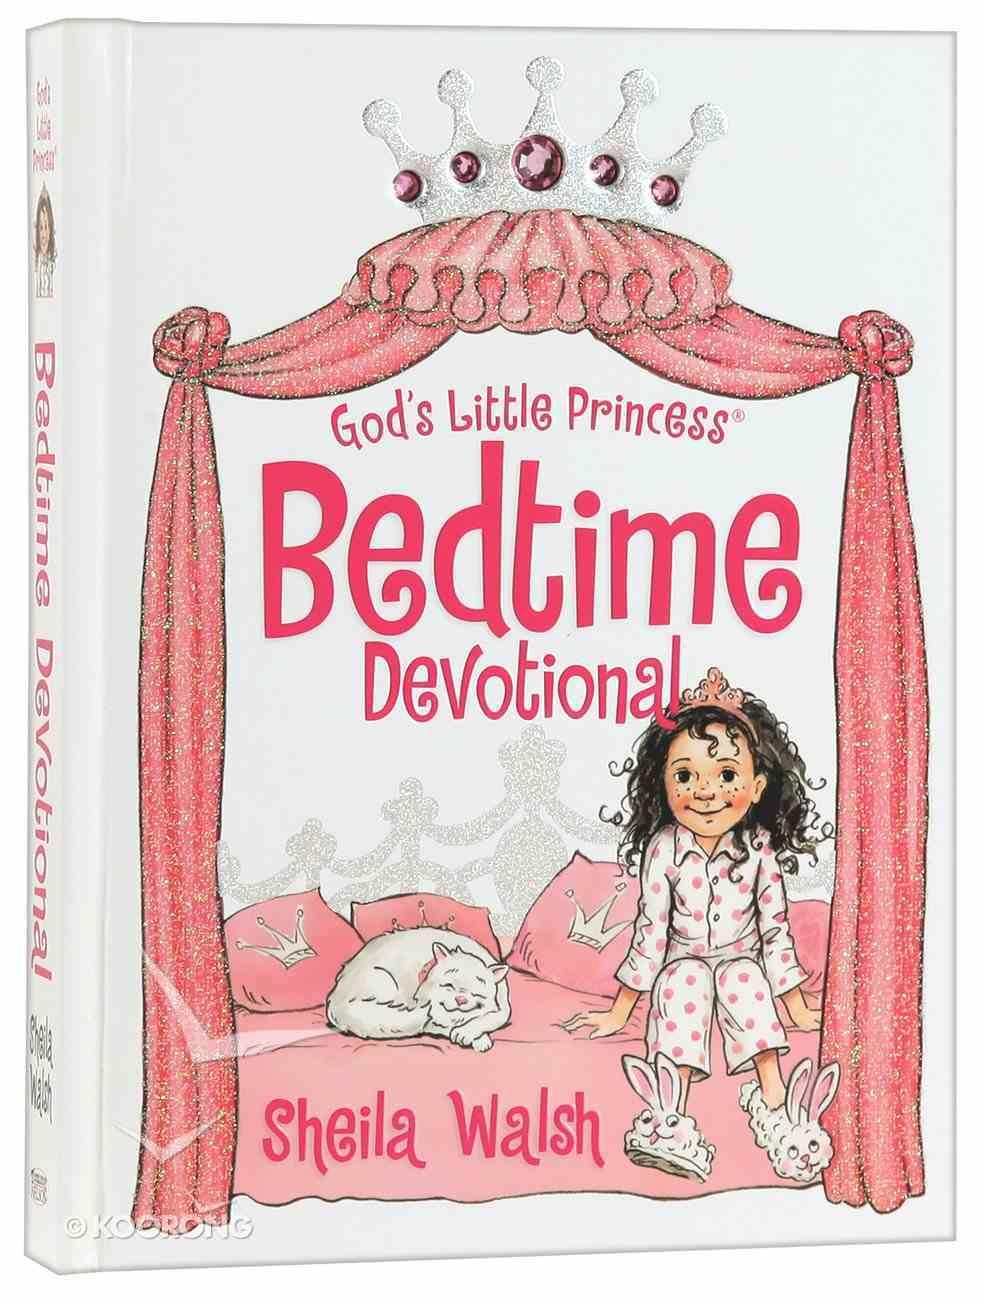 God's Little Princess Bedtime Devotional (Gigi, God's Little Princess Series) Hardback